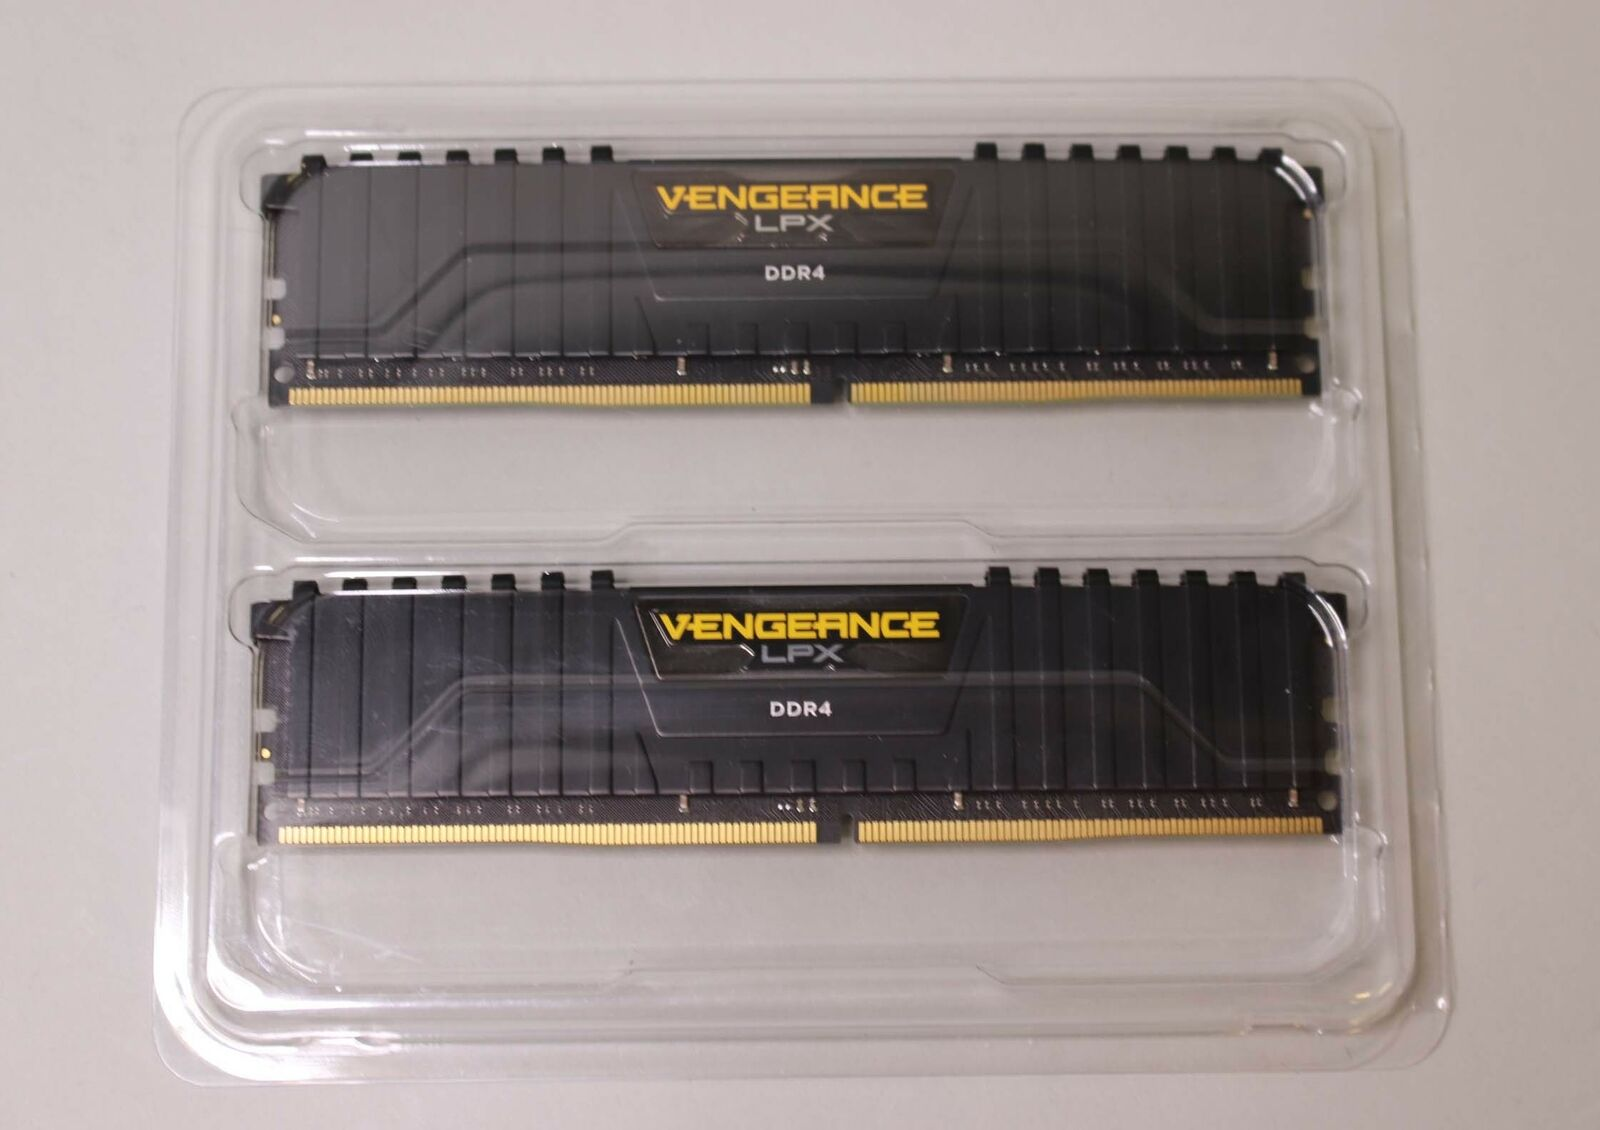 CORSAIR VENGEANCE LPX 16GB (8GB x 2) DDR4-3000 PC4-24000 - CMK16GX4M1A2400C14. Buy it now for 89.99